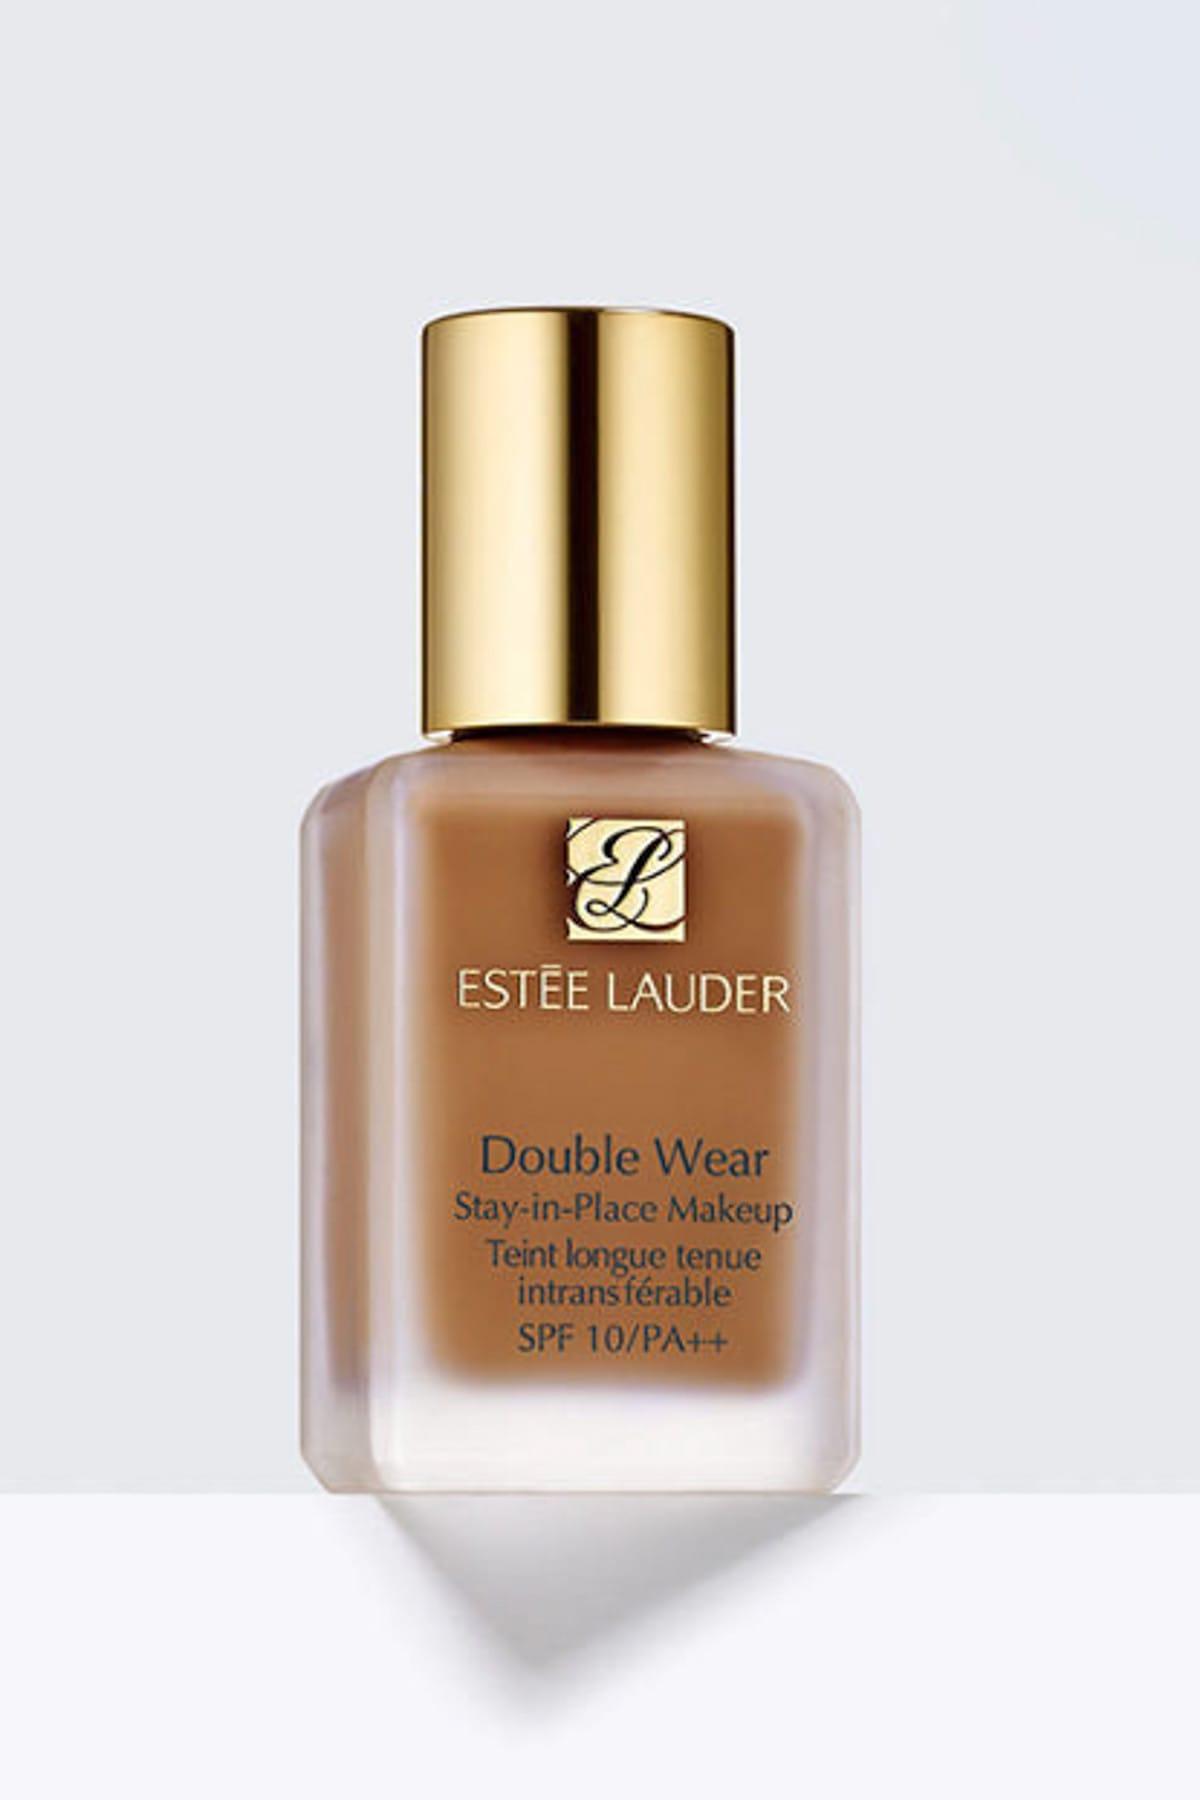 Estee Lauder Fondöten - Double Wear Foundation S.I.P Spf10 5W1.5 Cinnamon 30 ml 887167350977 1